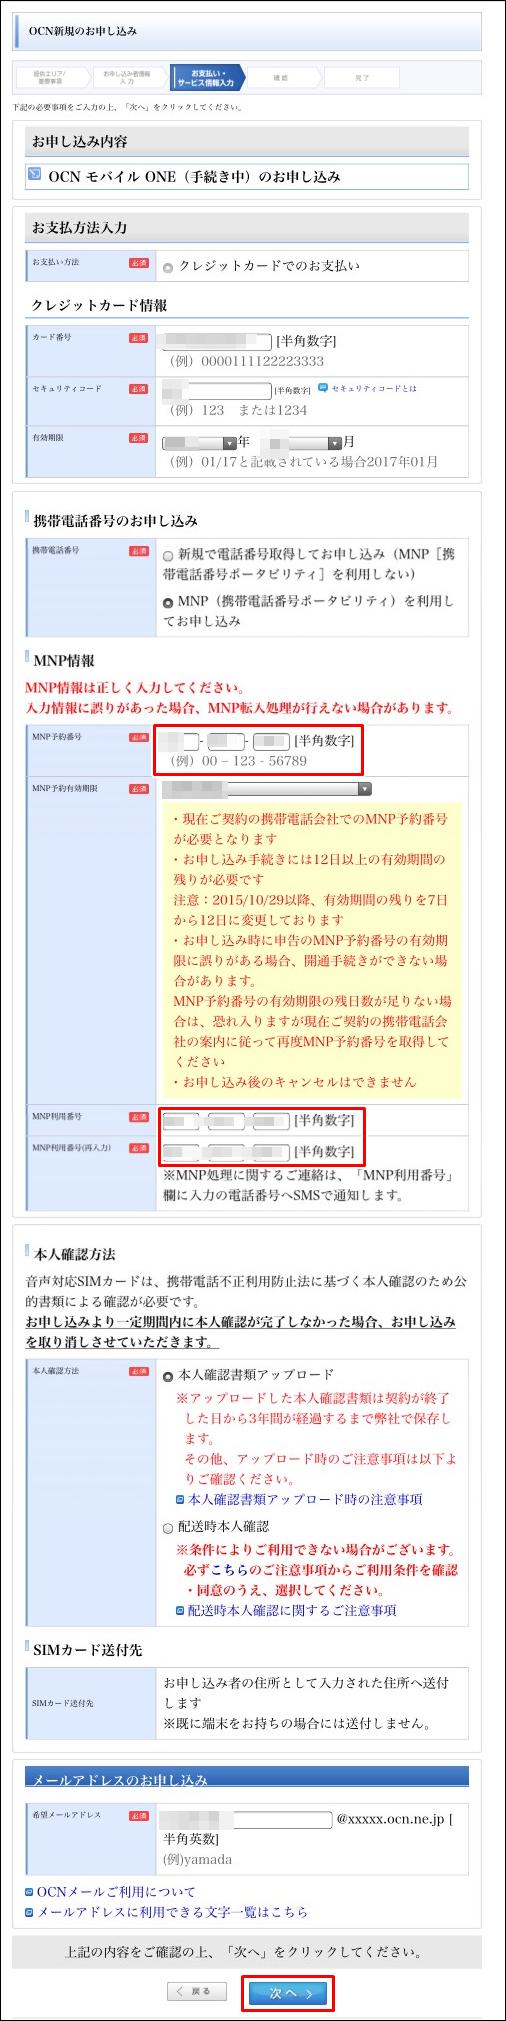 OCNモバイルのMNP登録方法(転用番号を入力)